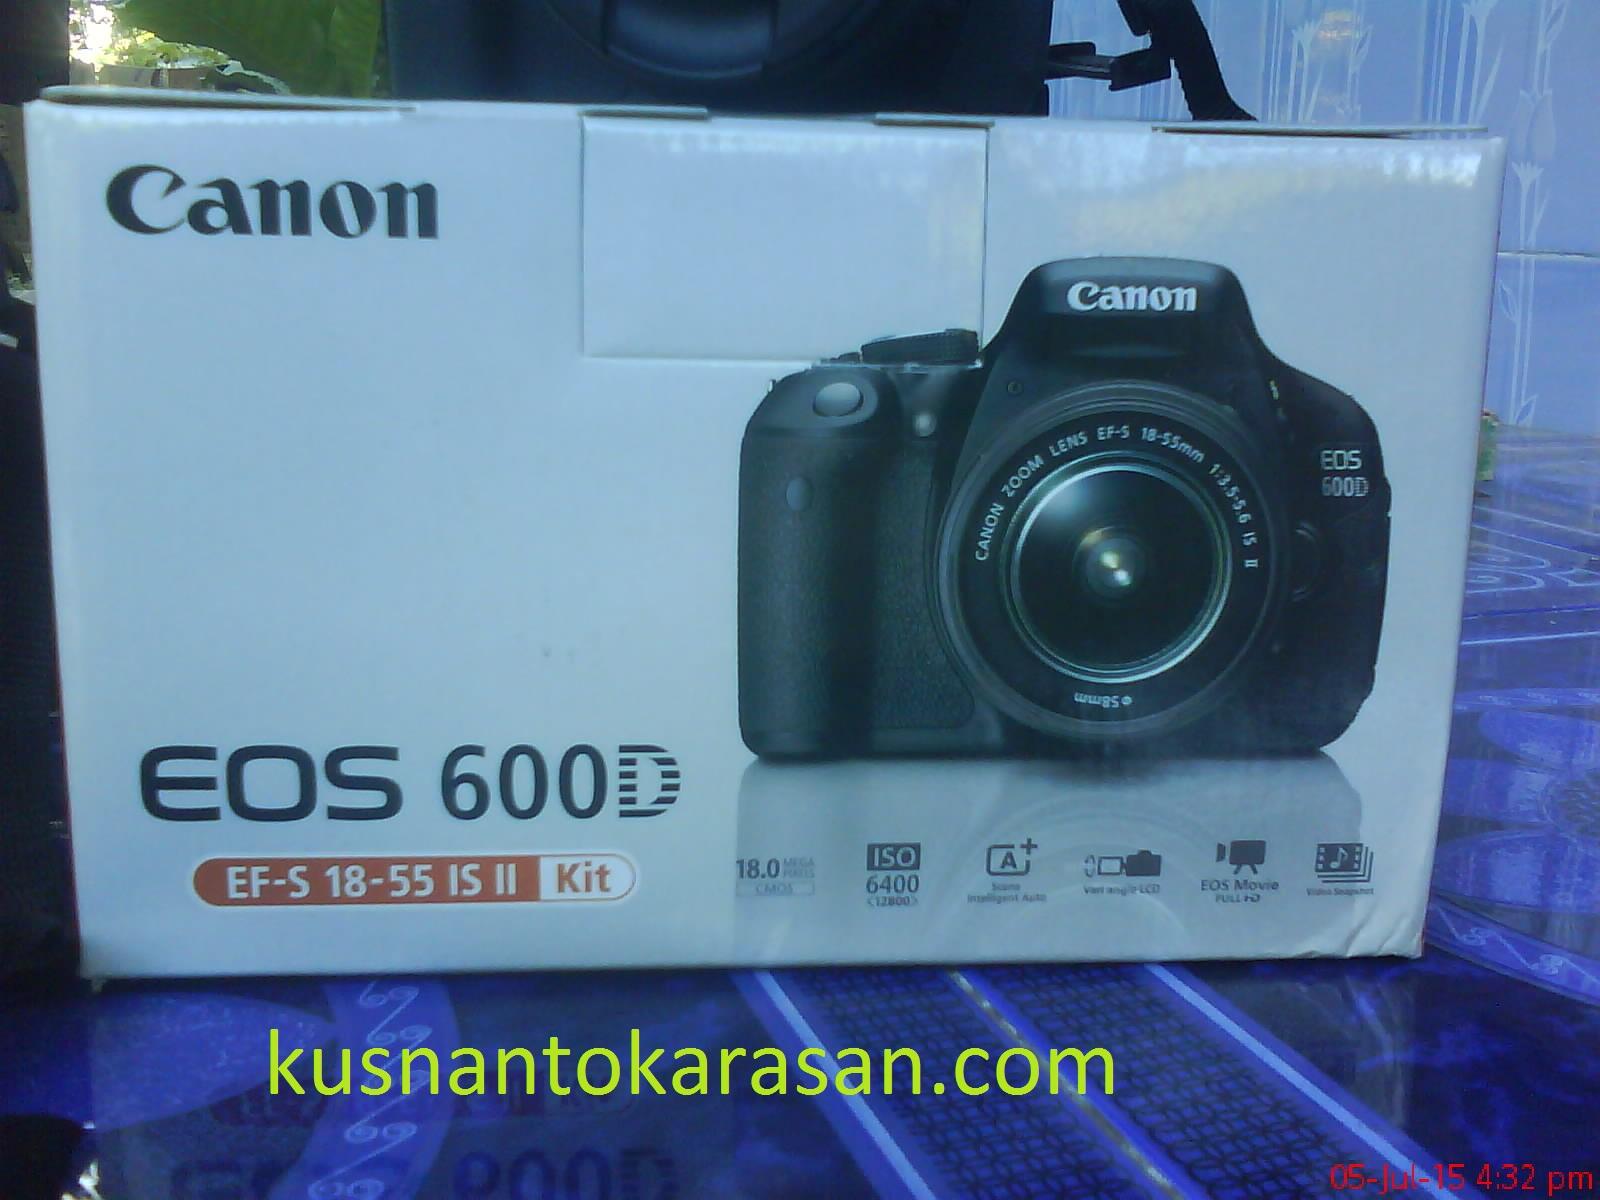 Bungkus kemasan kamera Canon EOS 600D